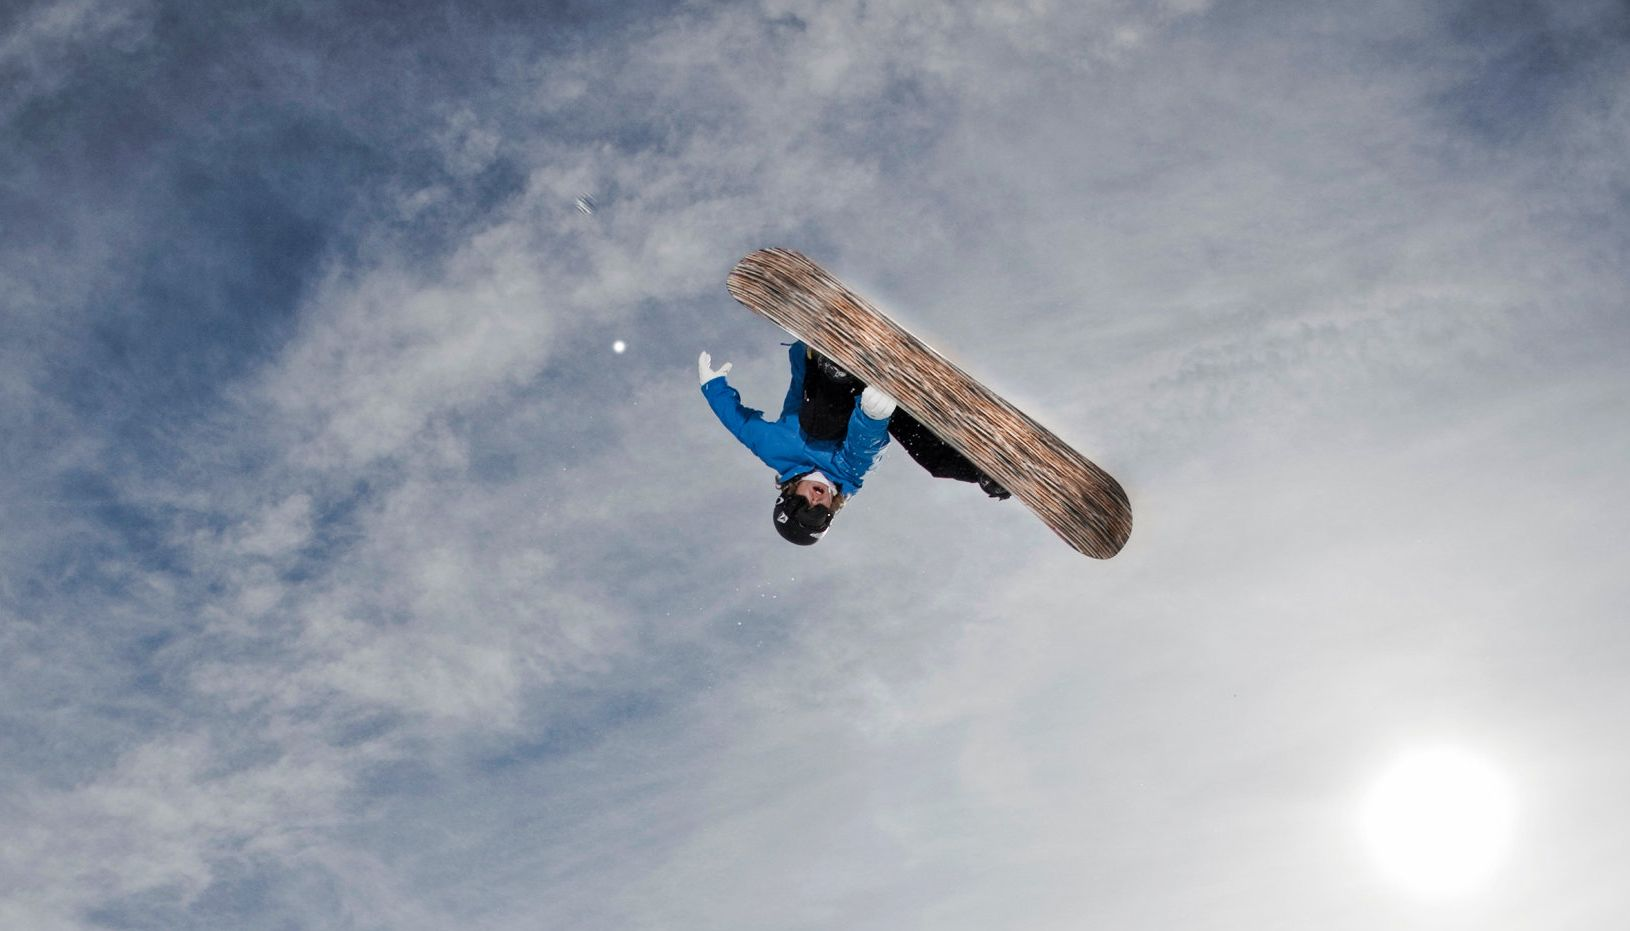 Snowboarding Upside Down in The Crash Reel